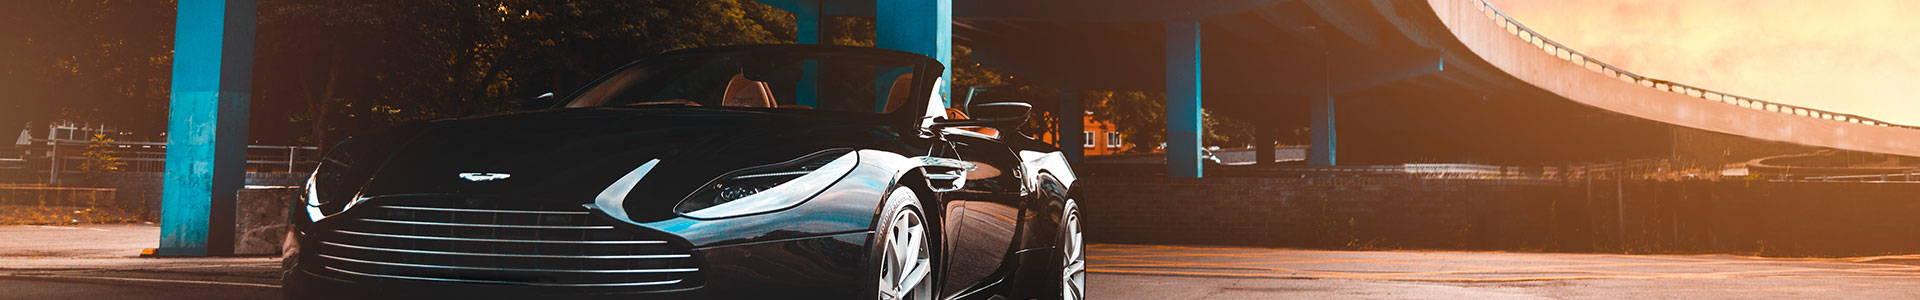 Aston Martin bodywork repair parts.